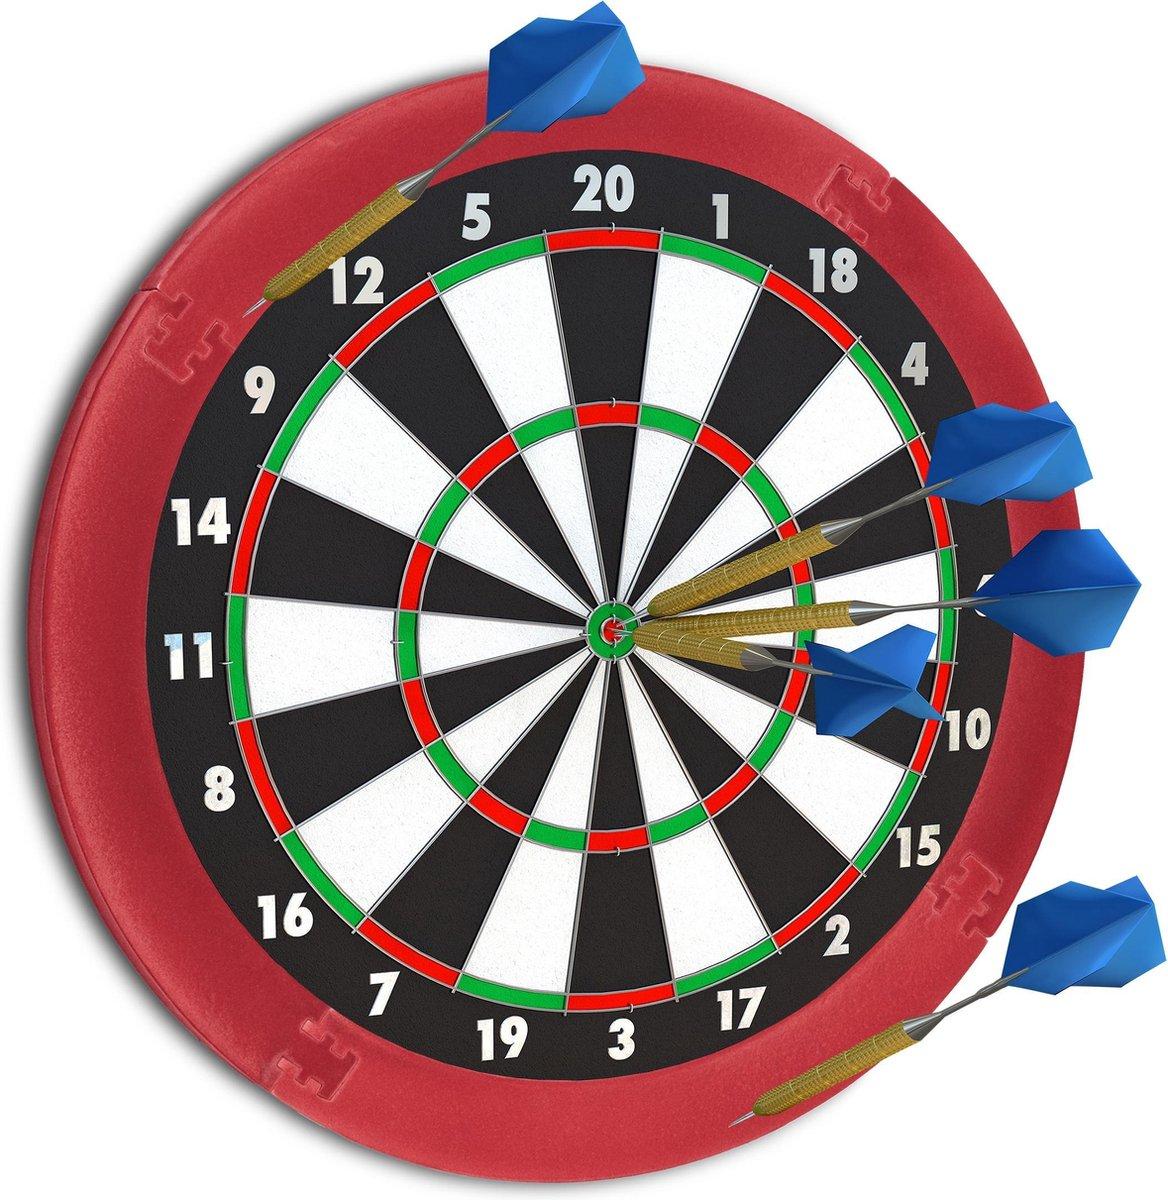 relaxdays dartbord surround ring - beschermrand - beschermring - ring voor dartbord - rond Bordeaux